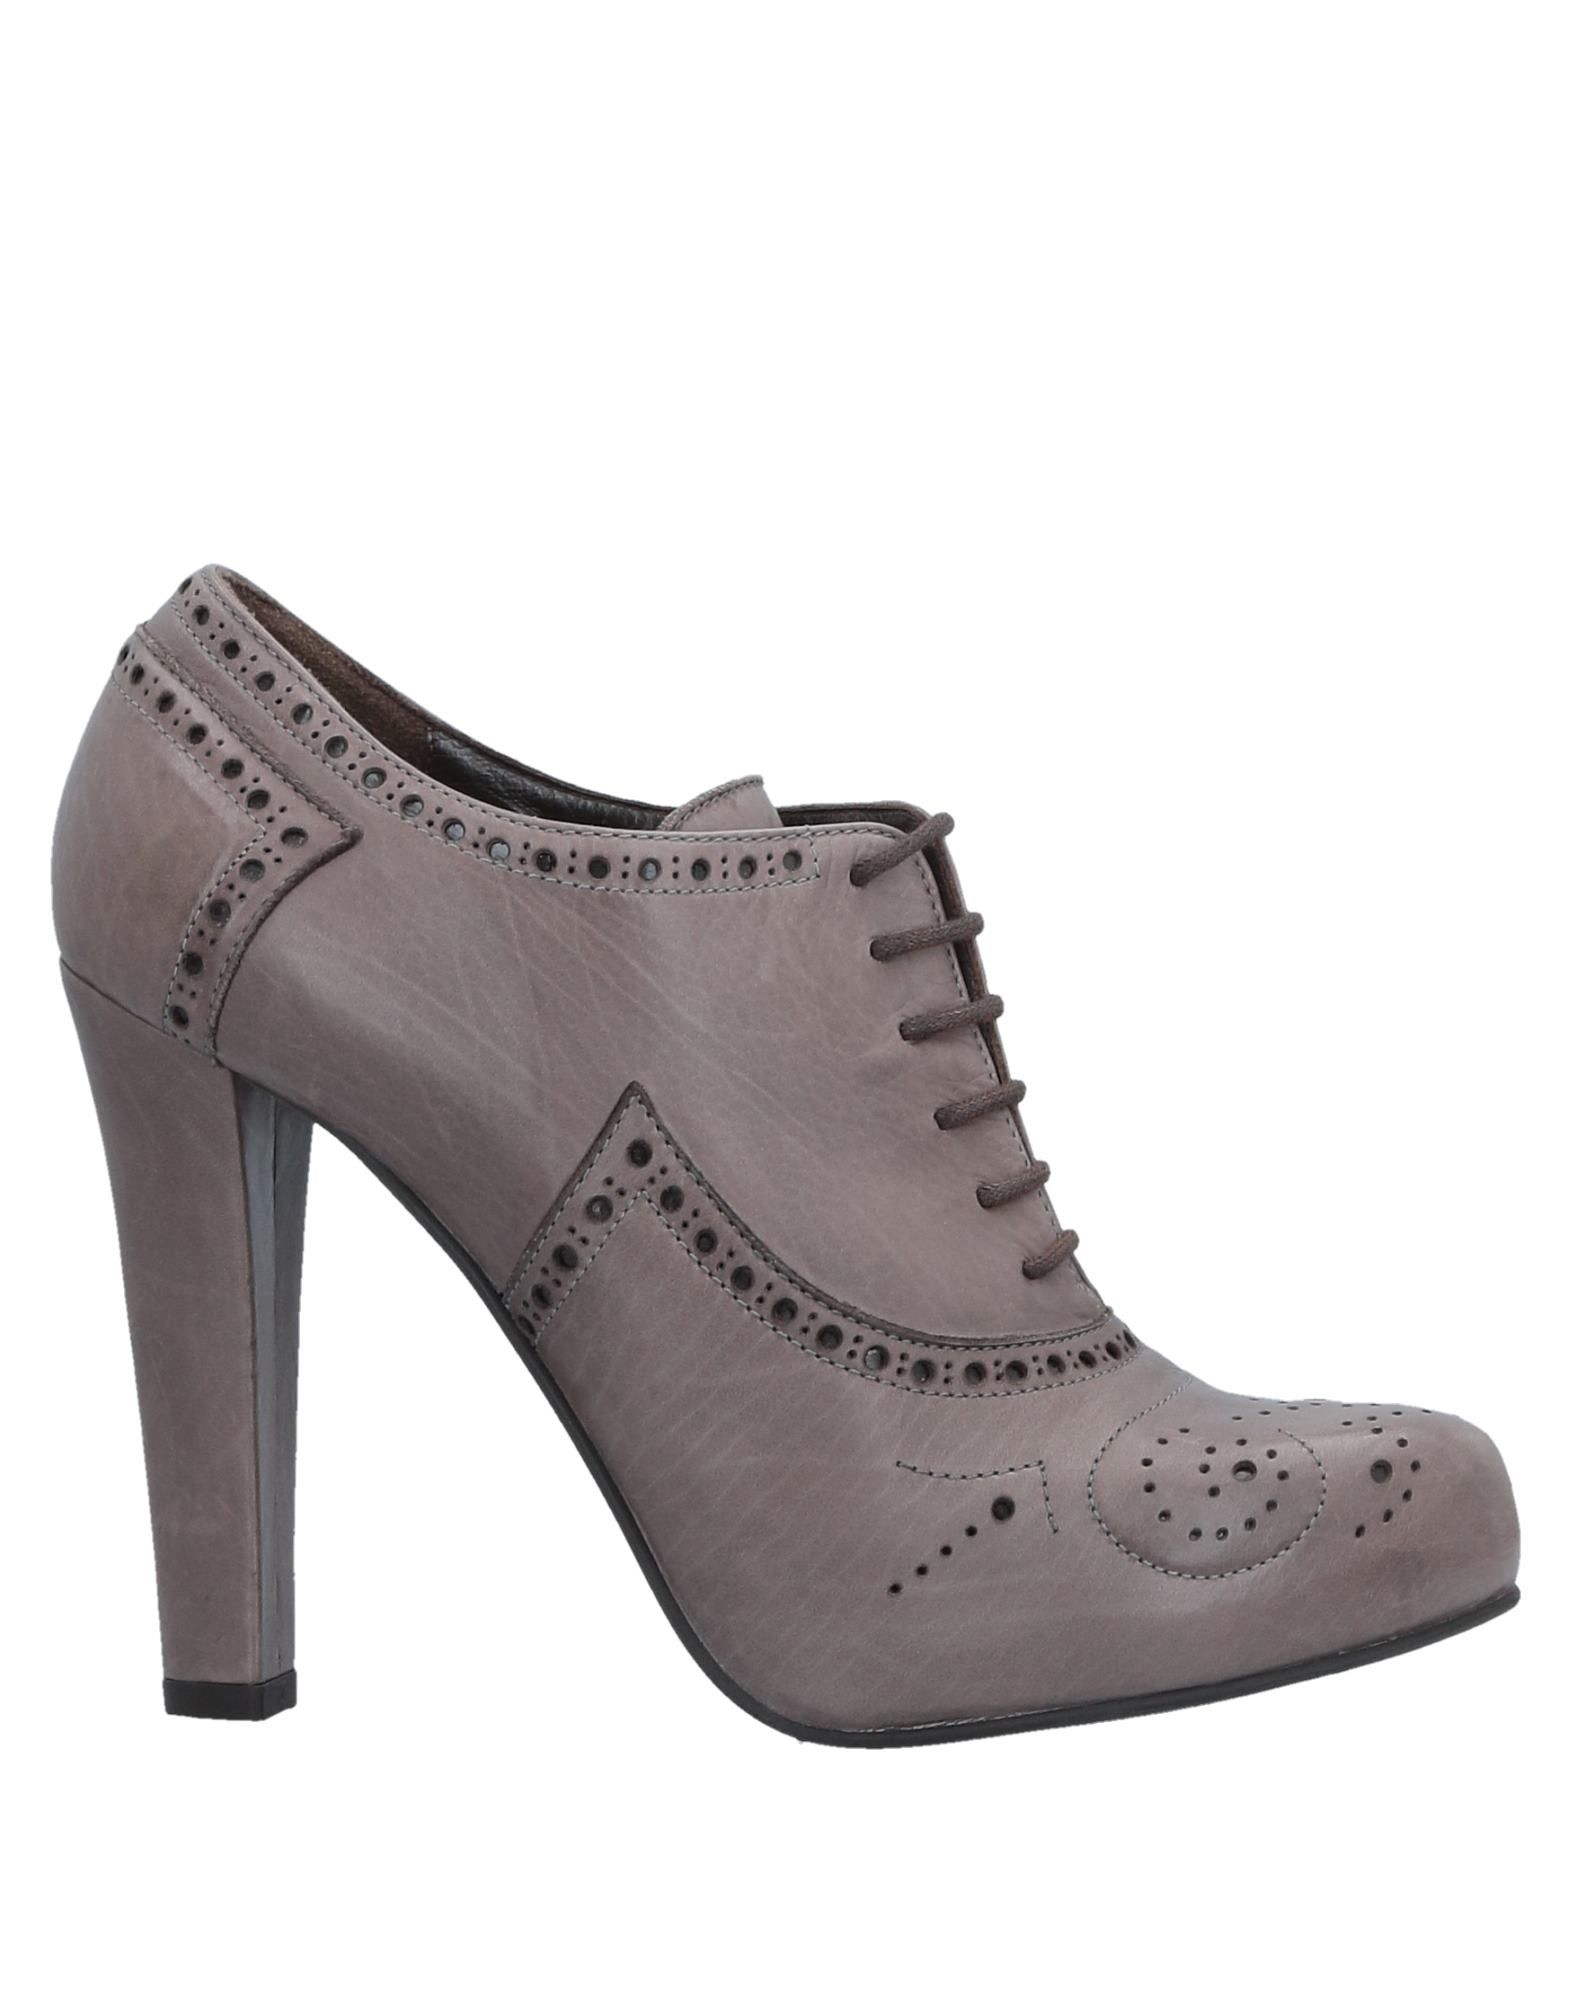 Фото - GIANCARLO PAOLI Обувь на шнурках обувь на высокой платформе dkny